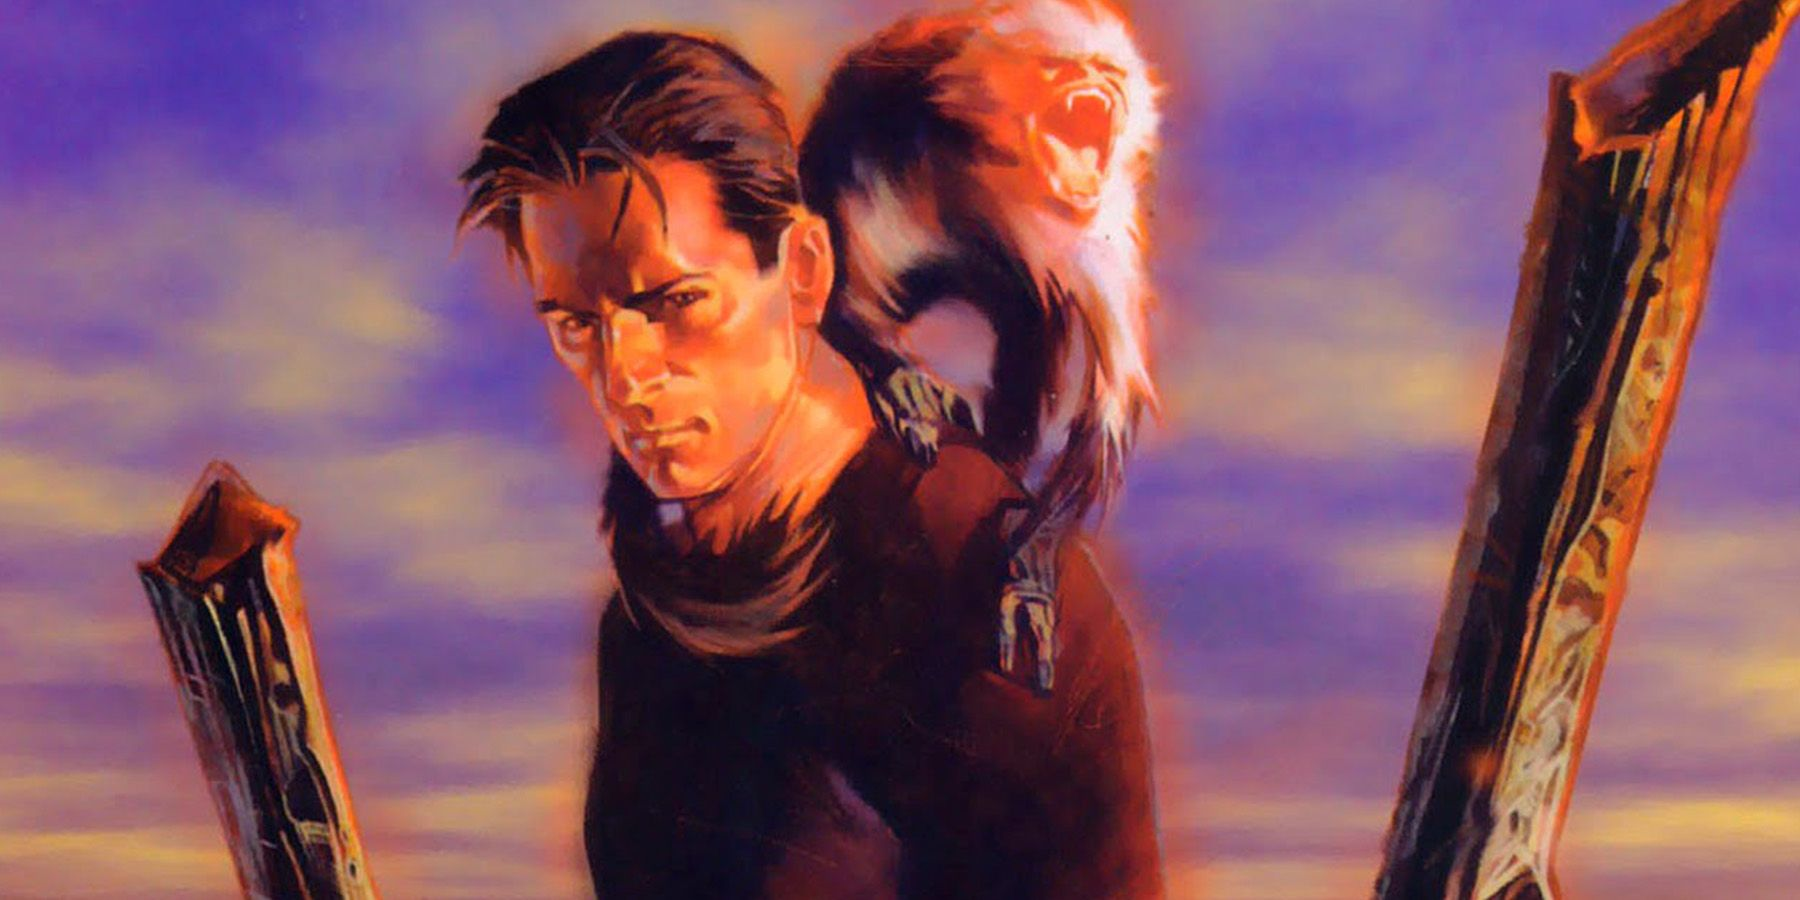 FX's Y: The Last Man Adaptation Lands New Showrunner | CBR